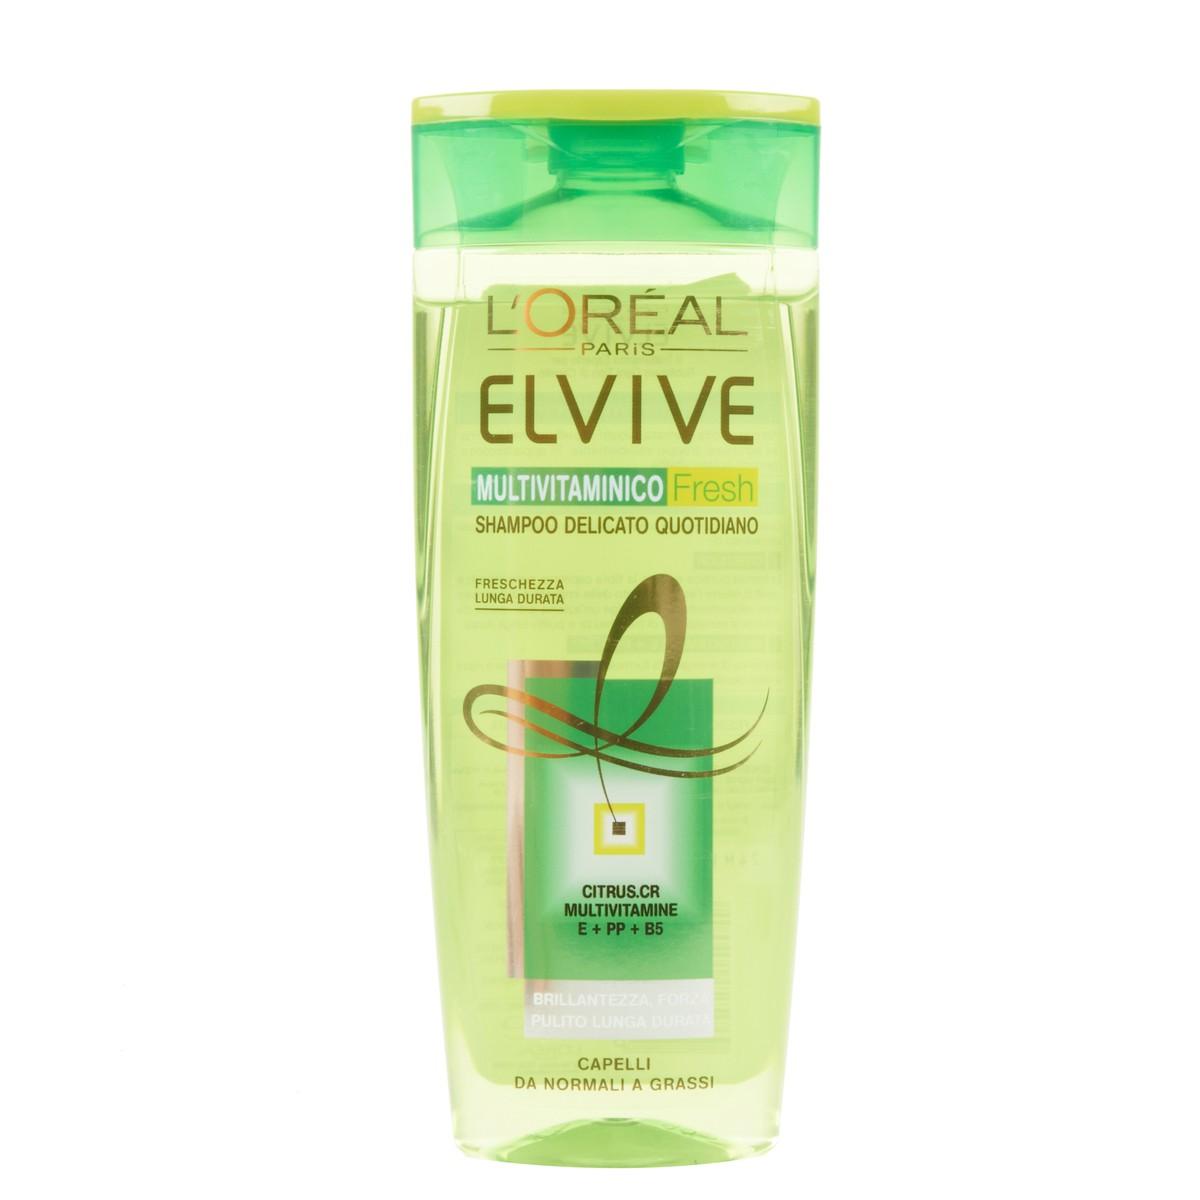 Elvive L'Oréal Paris? Shampoo delicato Multivitaminico Fresh